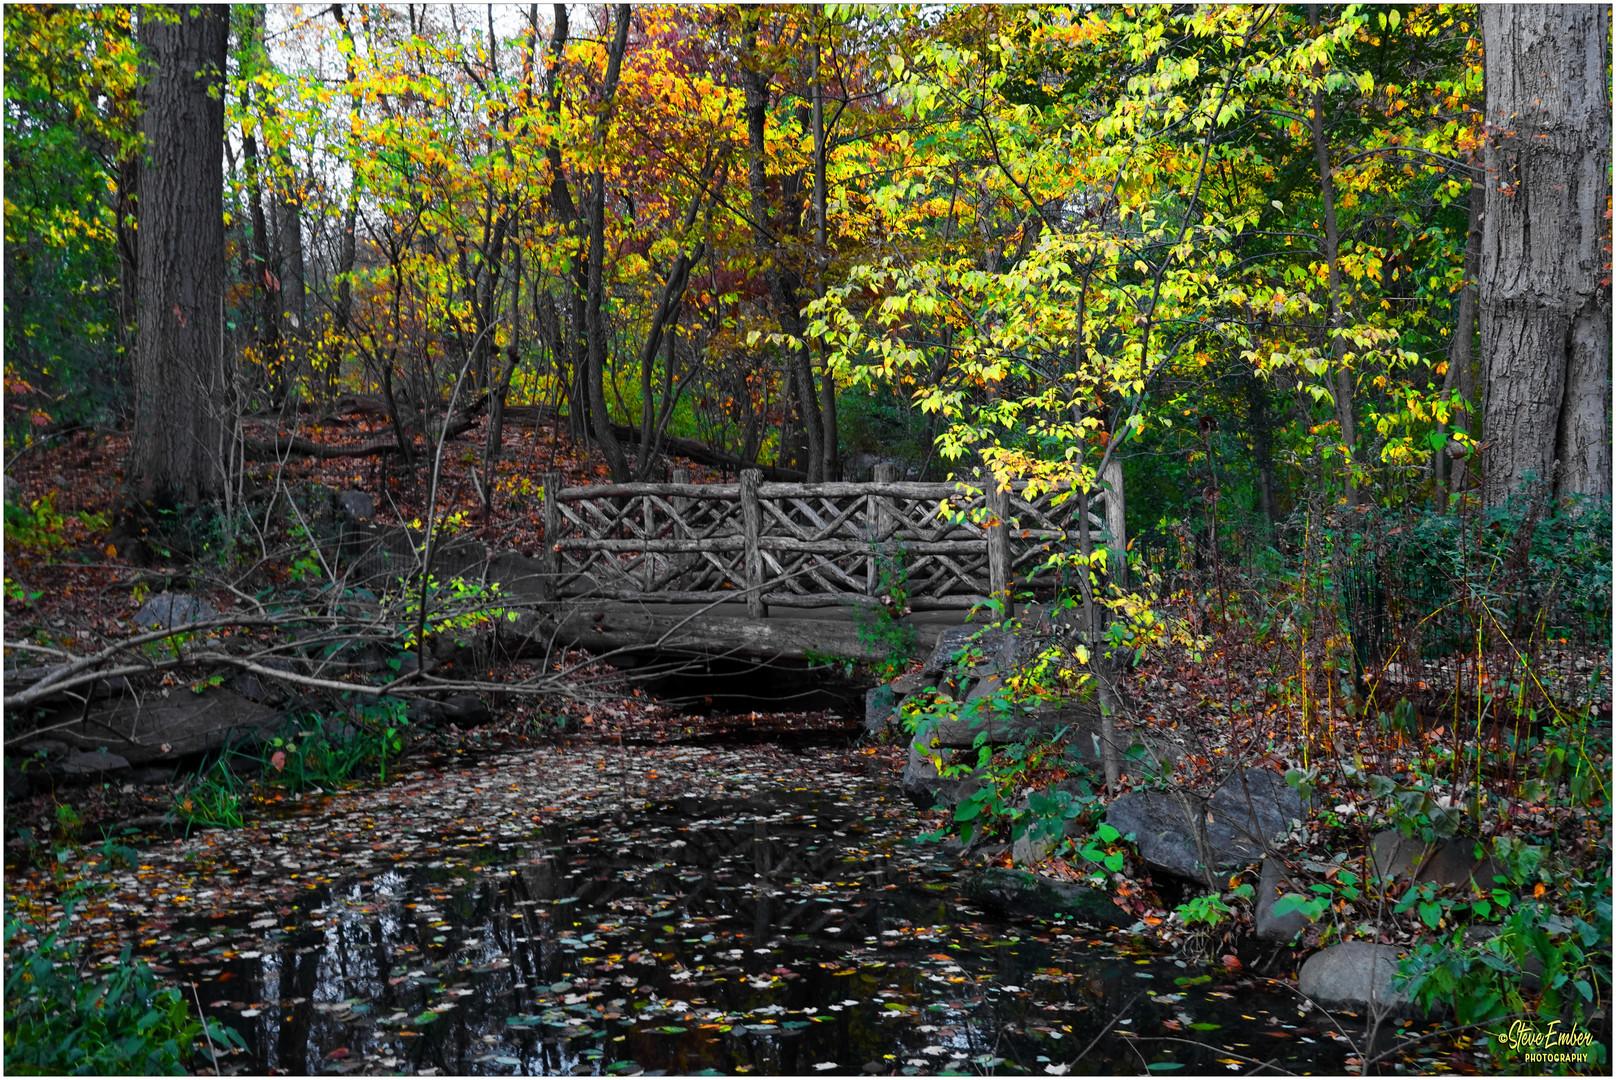 A Rustic Bridge in The Ramble - A Central Park Autumn  Impression